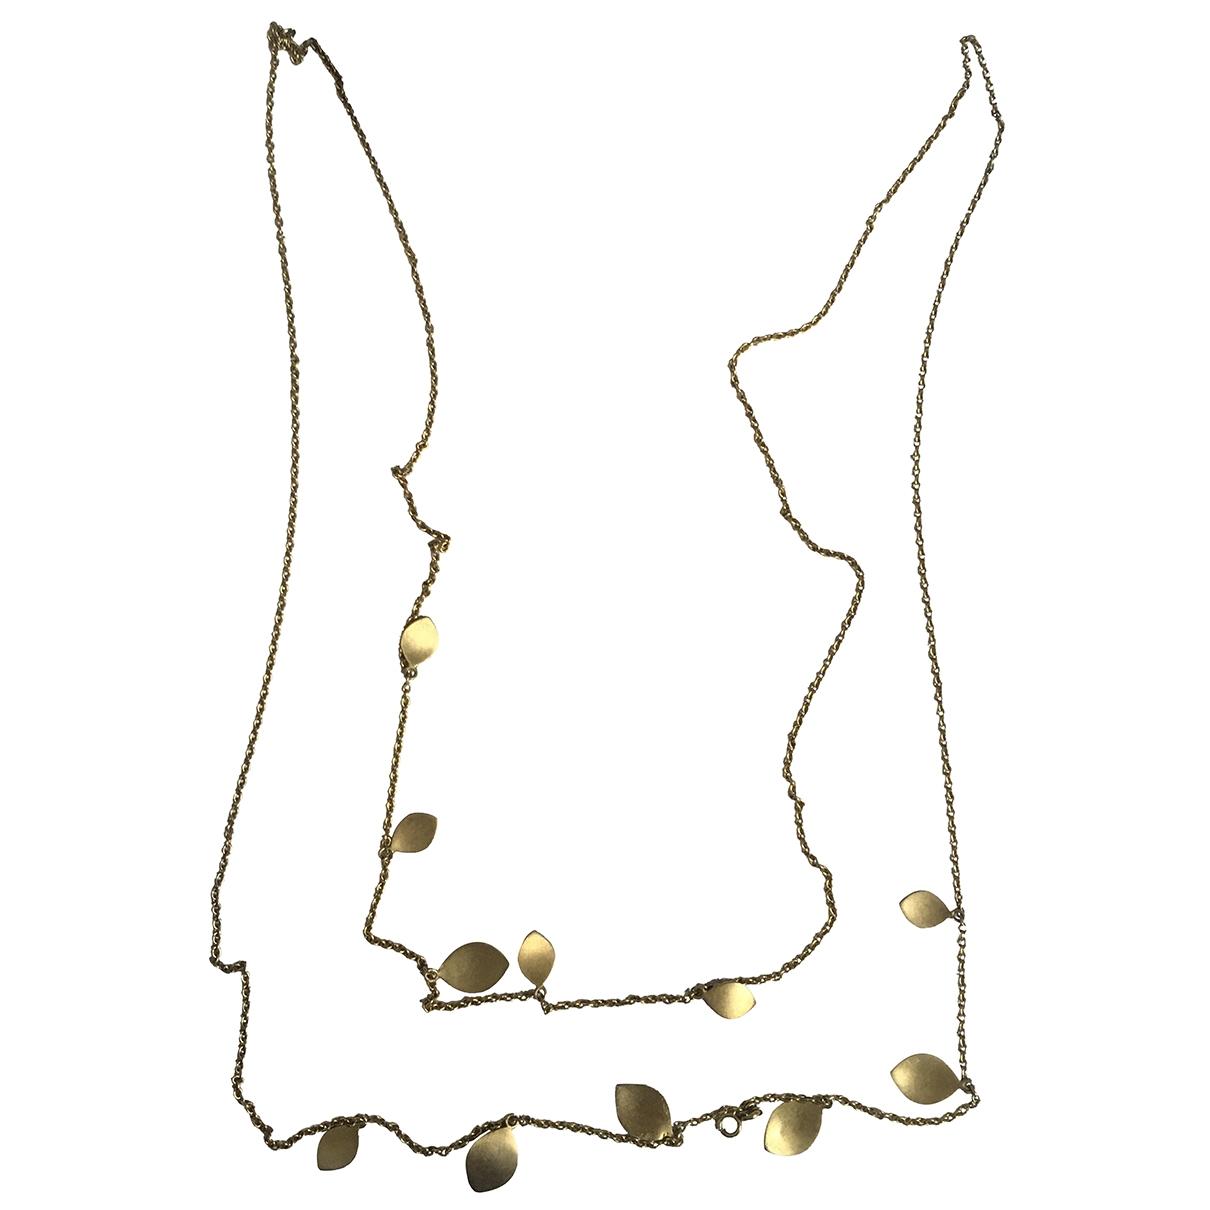 Collar largo Motifs Floraux Non Signe / Unsigned